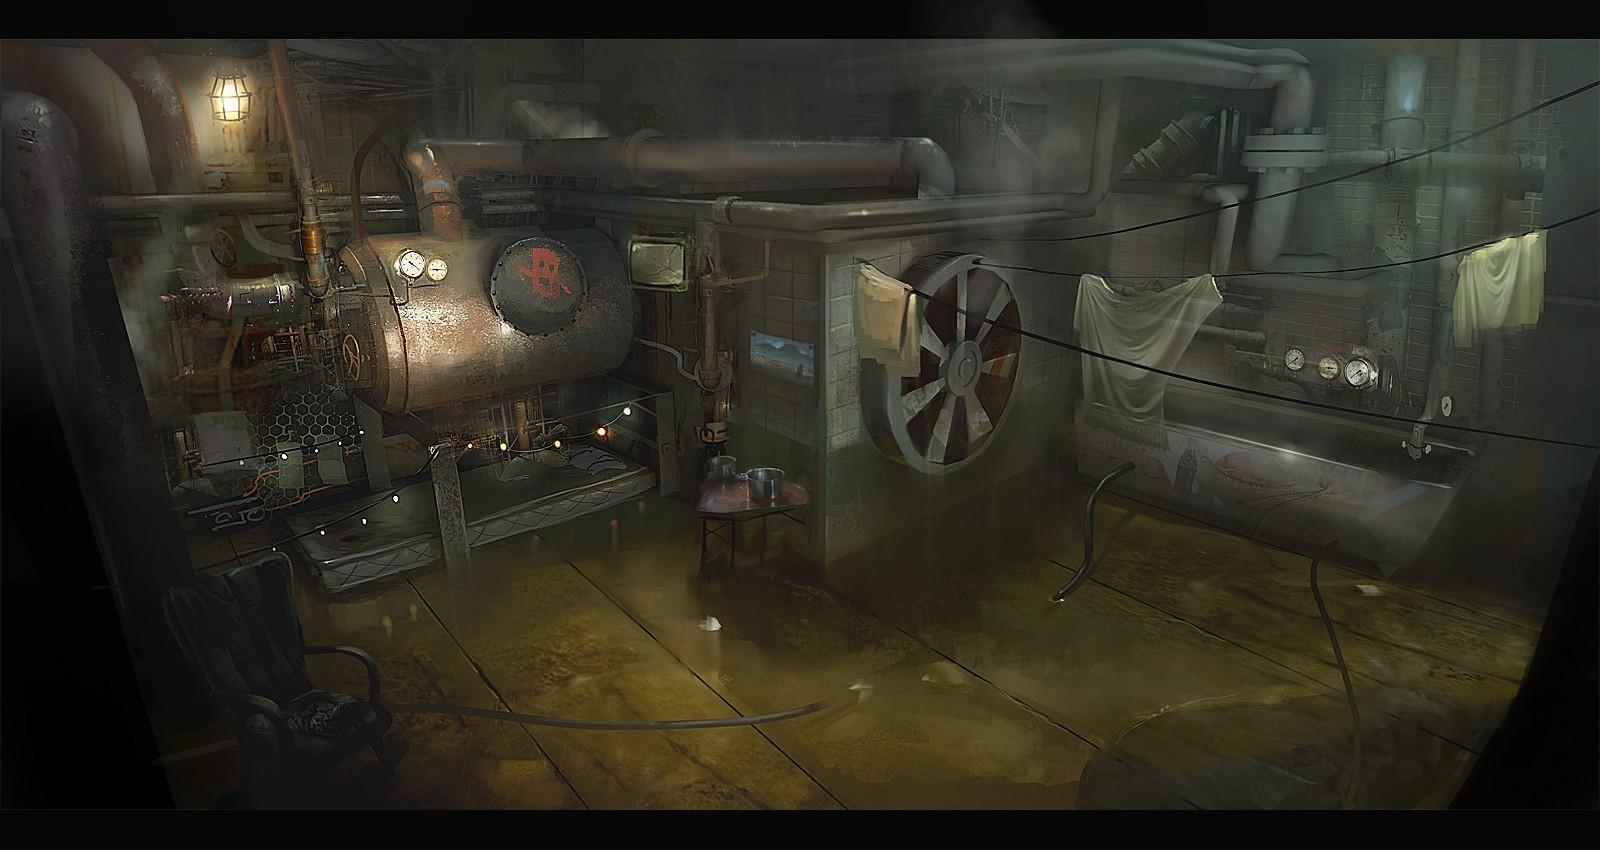 Creepy Old Boiler Room